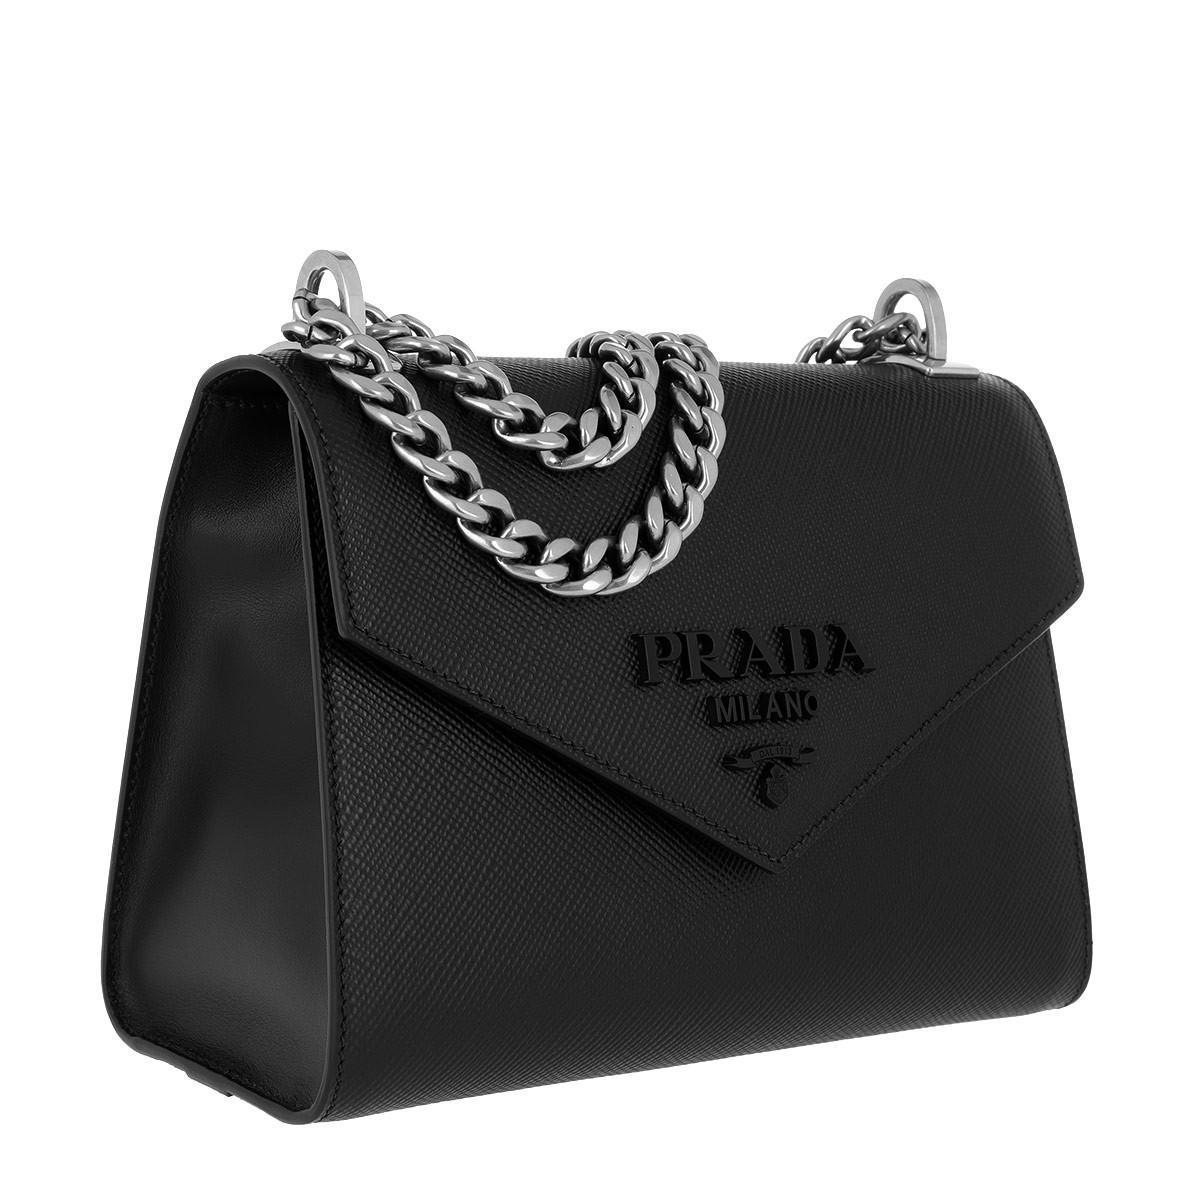 54d0e509aa78 Prada - Black Monochrome Crossbody Bag Medium Nero - Lyst. View fullscreen